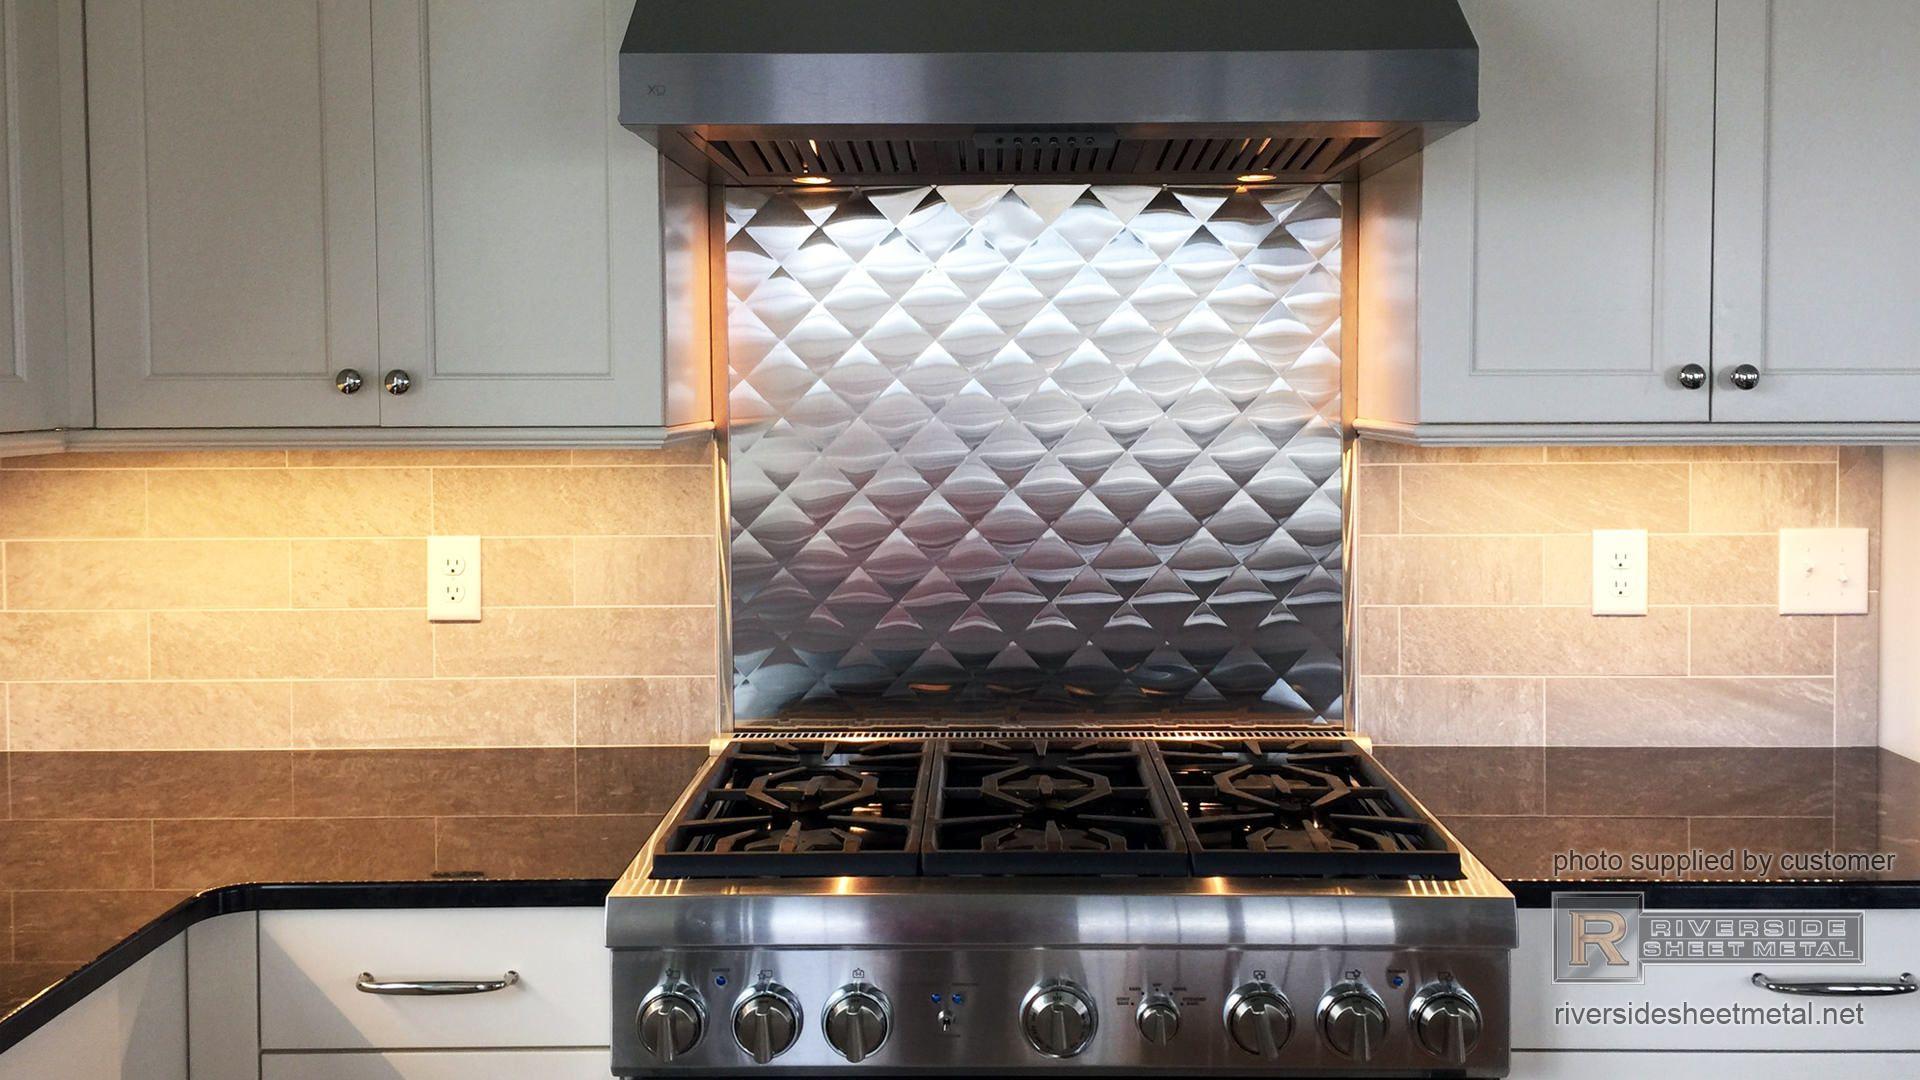 Quilted Diamond Stainless Steel Back Splash Installation Steel